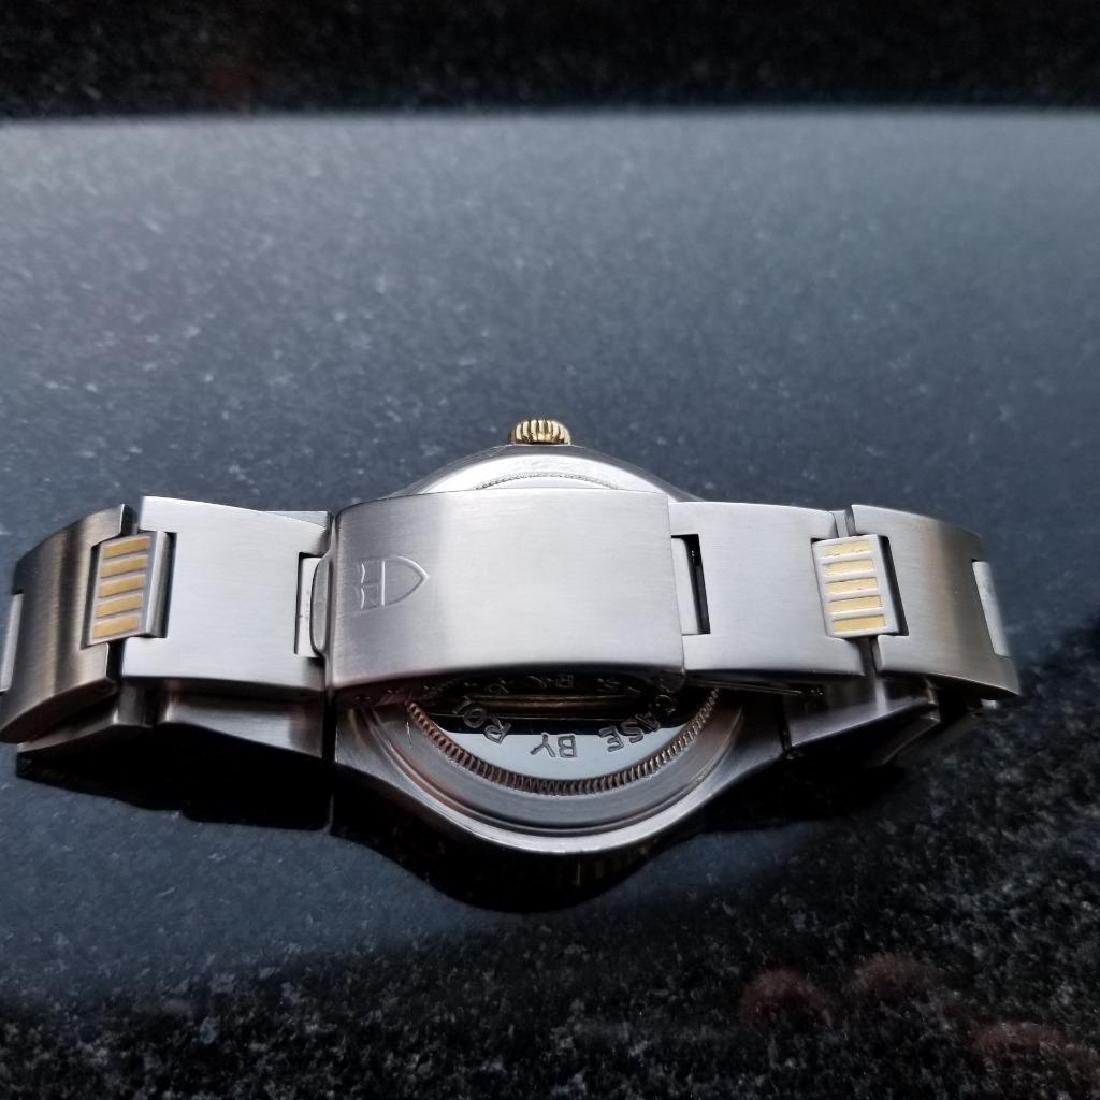 Rolex Vintage Tudor Prince Oysterdate 1975 Automatic - 8